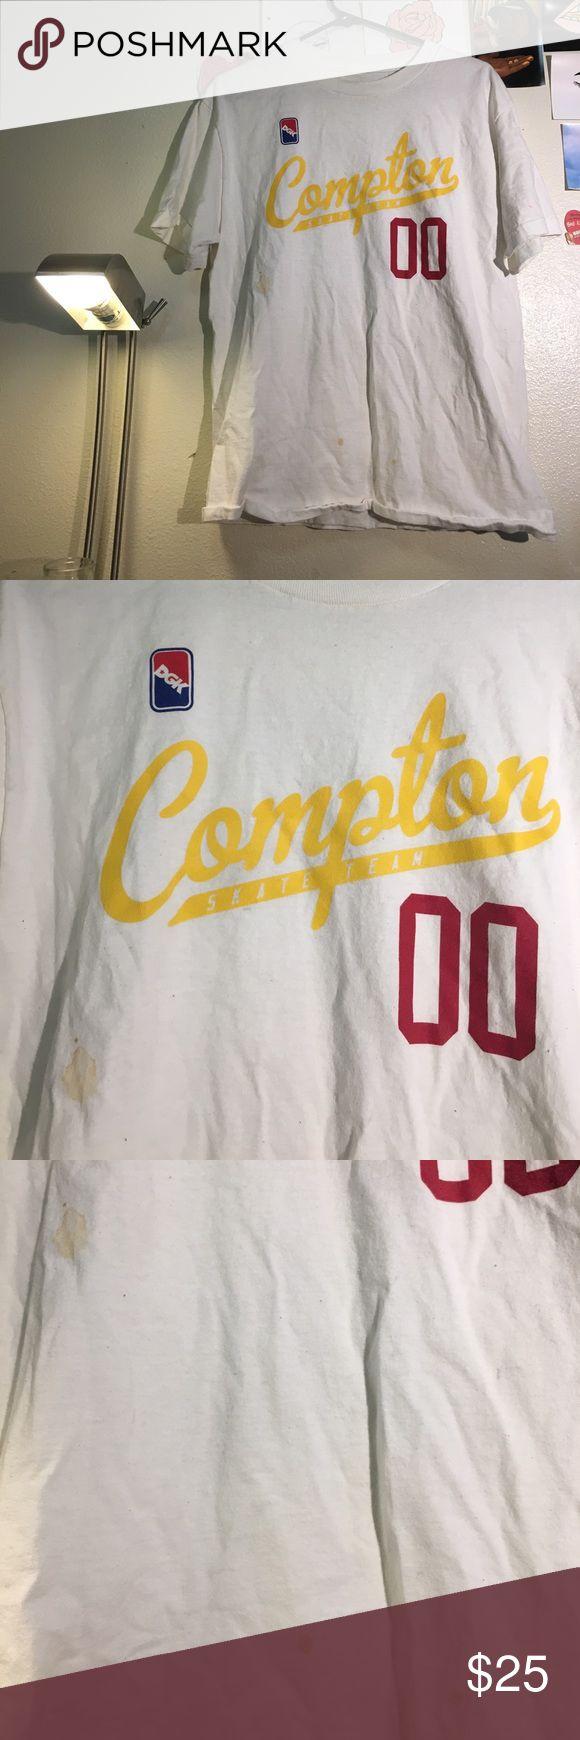 DGK Scumbag Shirt / Steven Fernandez imlilcloud old, has multiple stains / no longer available in zumiez or websites. DGK Shirts Tees - Short Sleeve